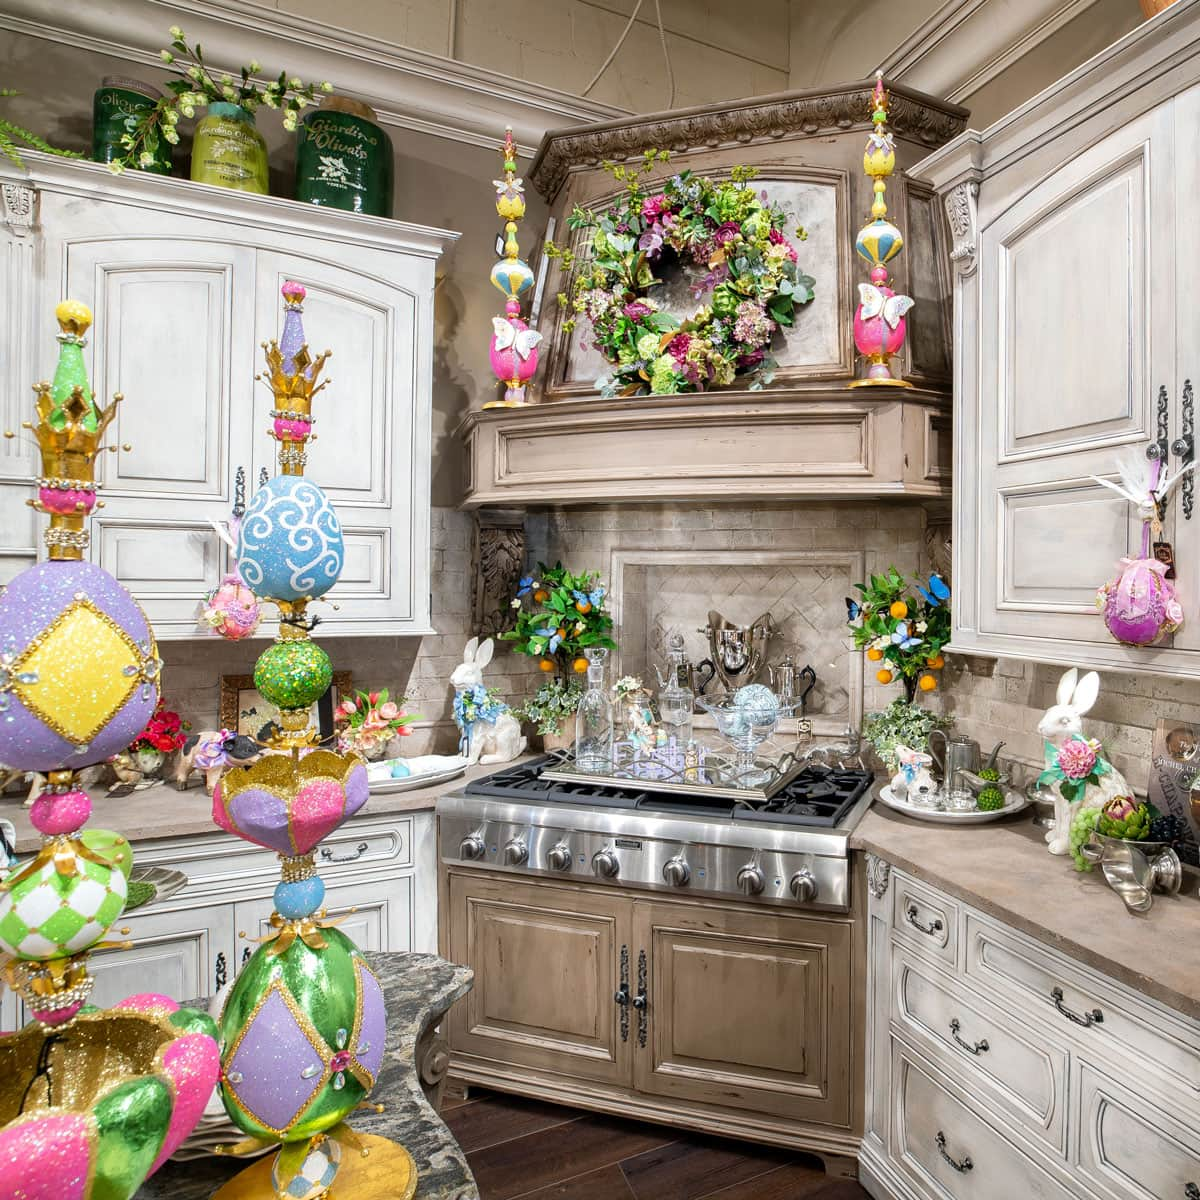 Spring-Kitchen-Hood-Decorating-Ideas-1×1